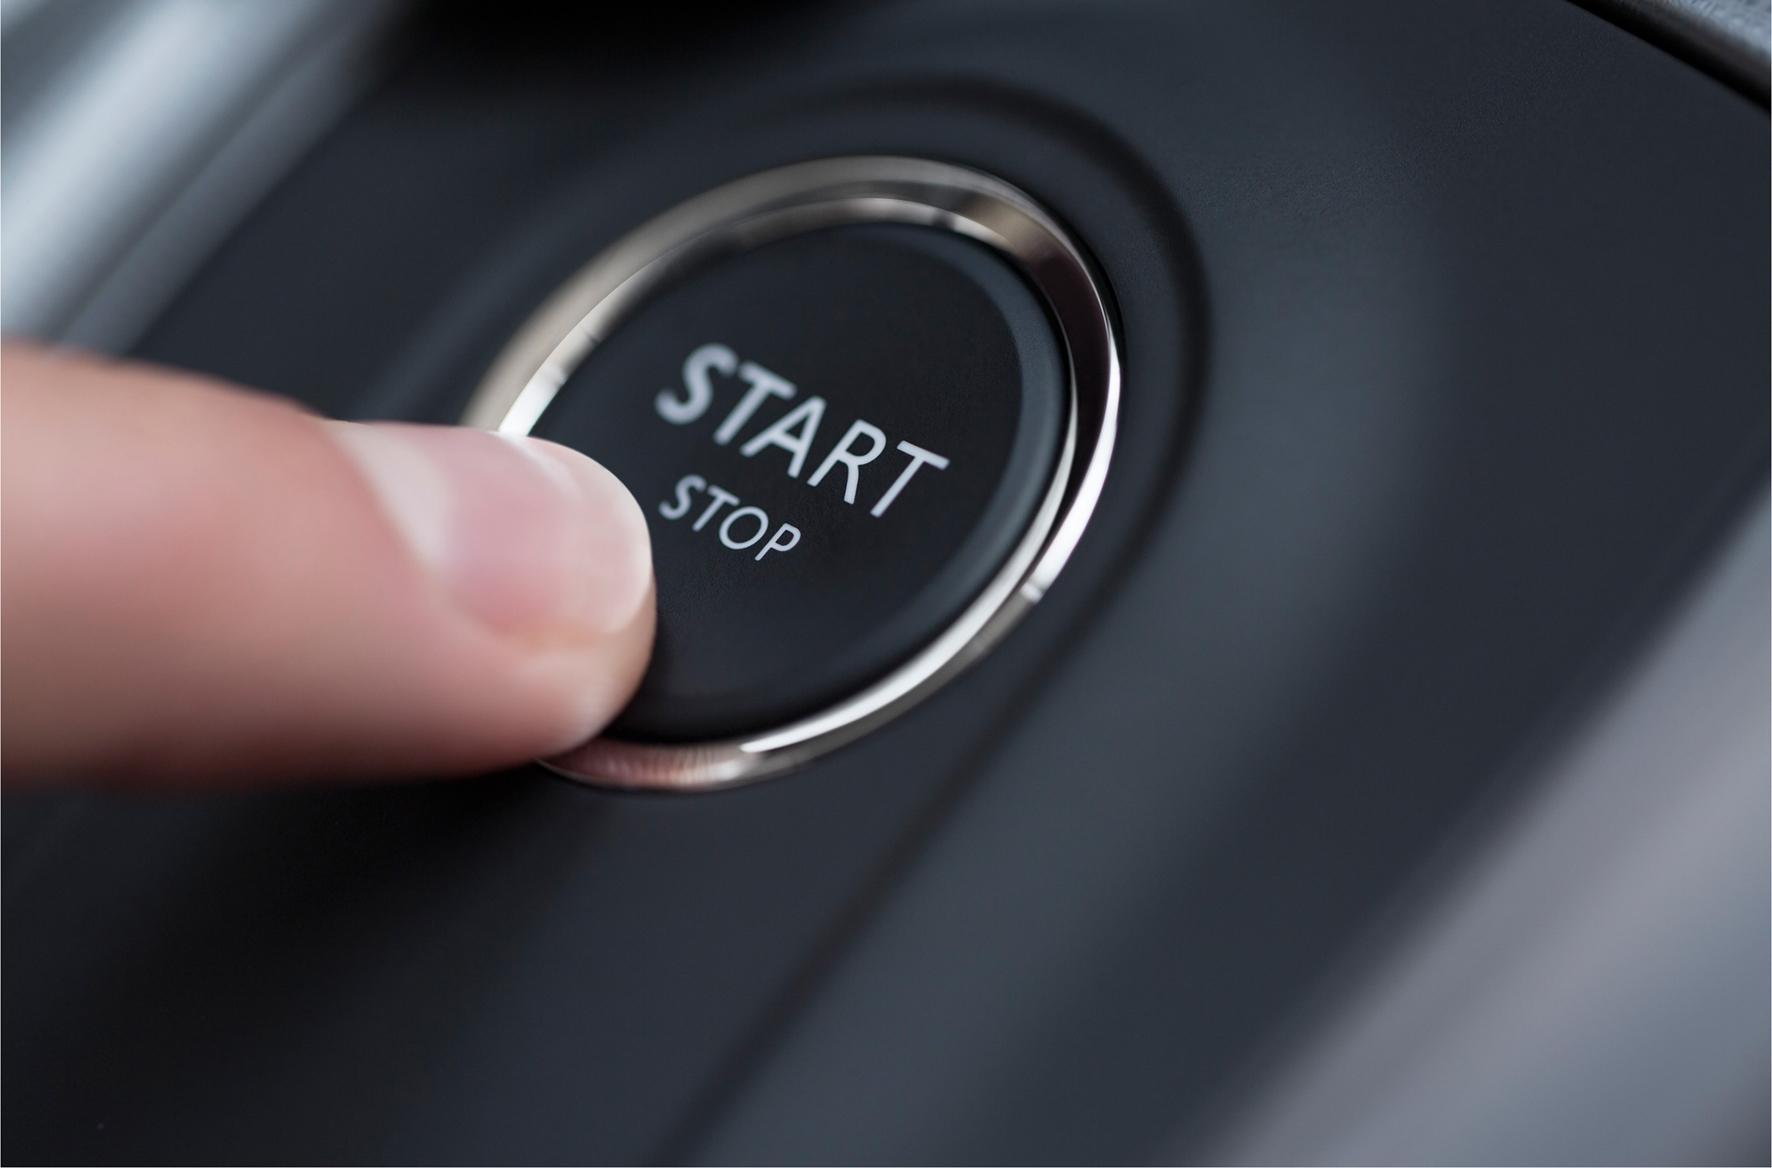 2015 Citroen C4 engine stop-start button (keyless)